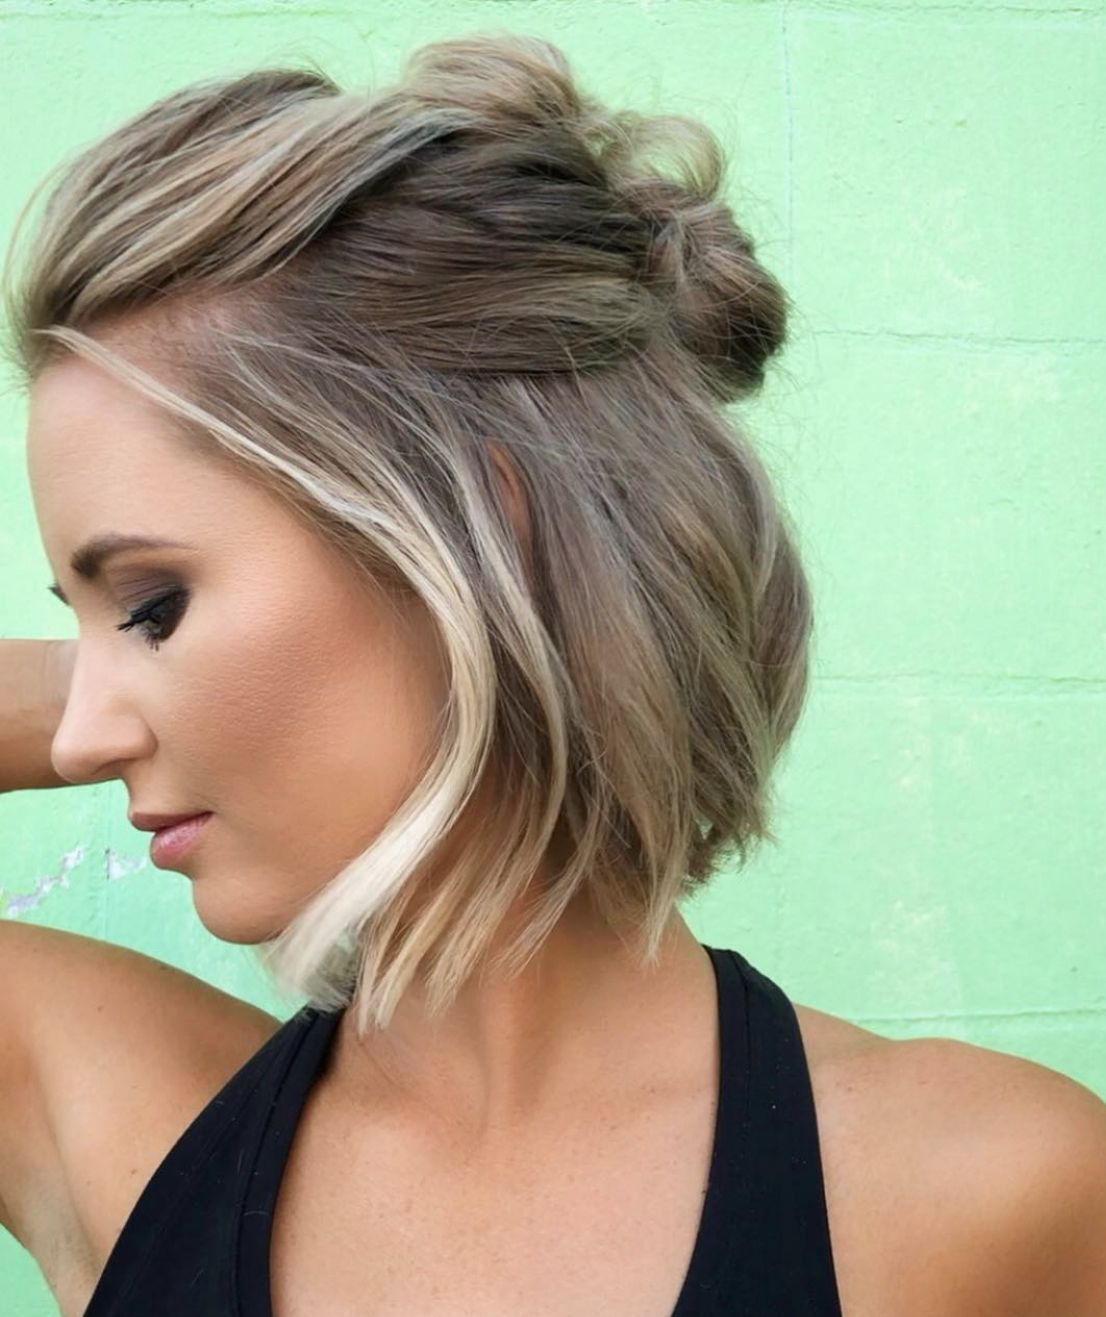 Pin Van None Op Hair Kapsels Ovaal Gezicht Kapsels Korte Kapsels